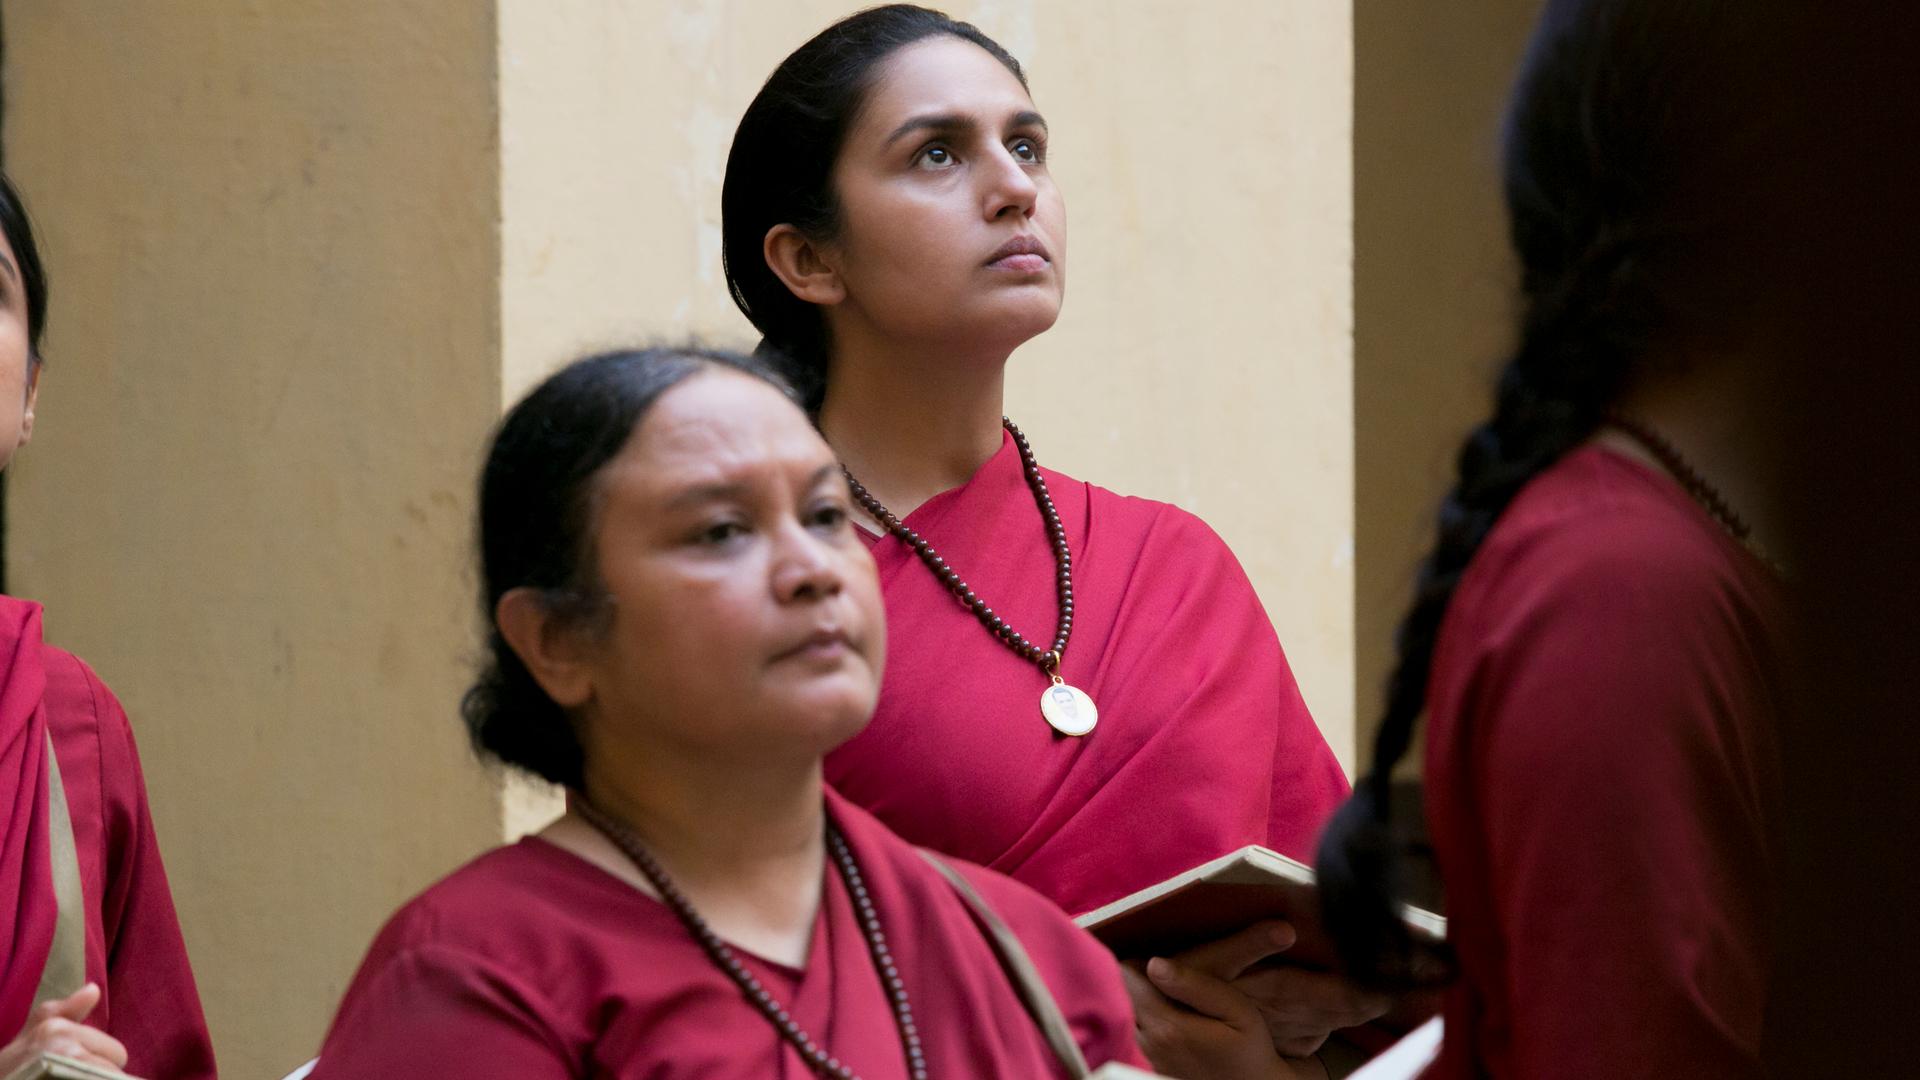 Leila Netflix Indian original TV series